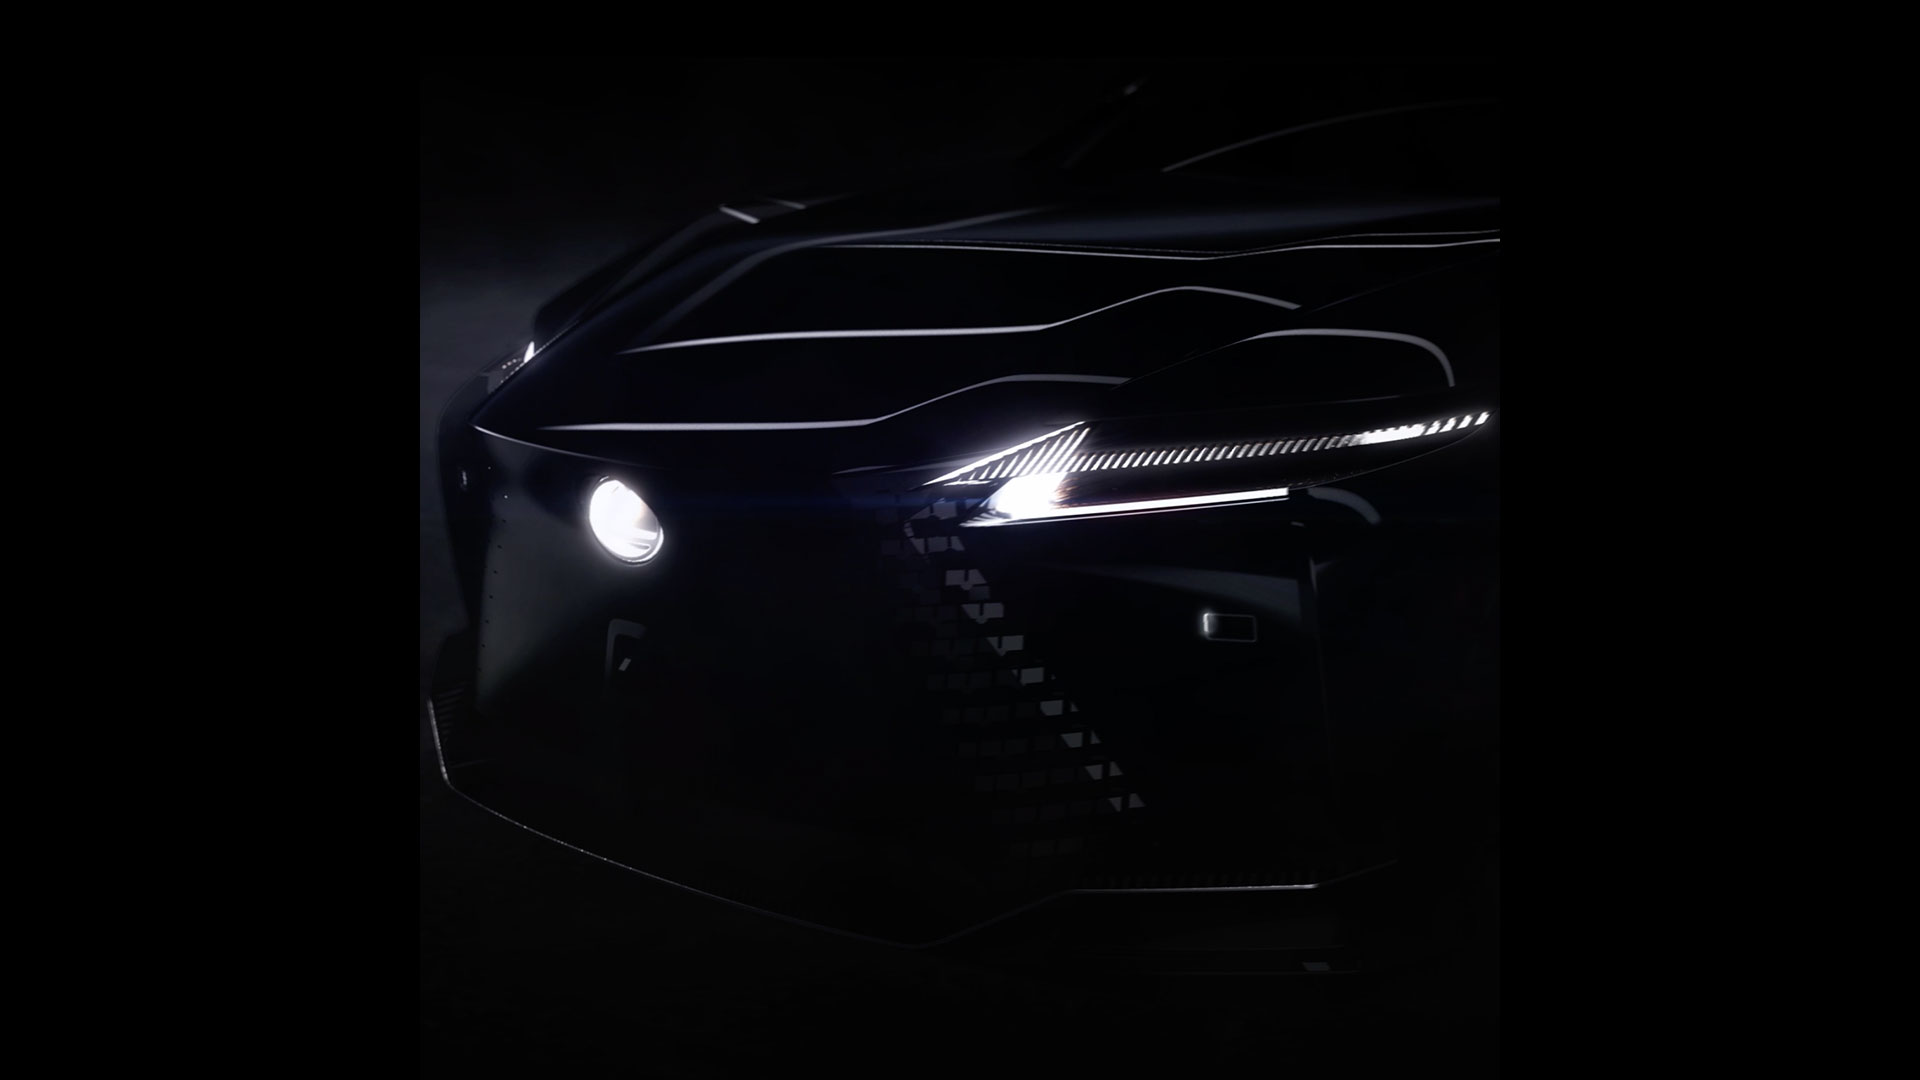 2021 lexus concept car gallery 02